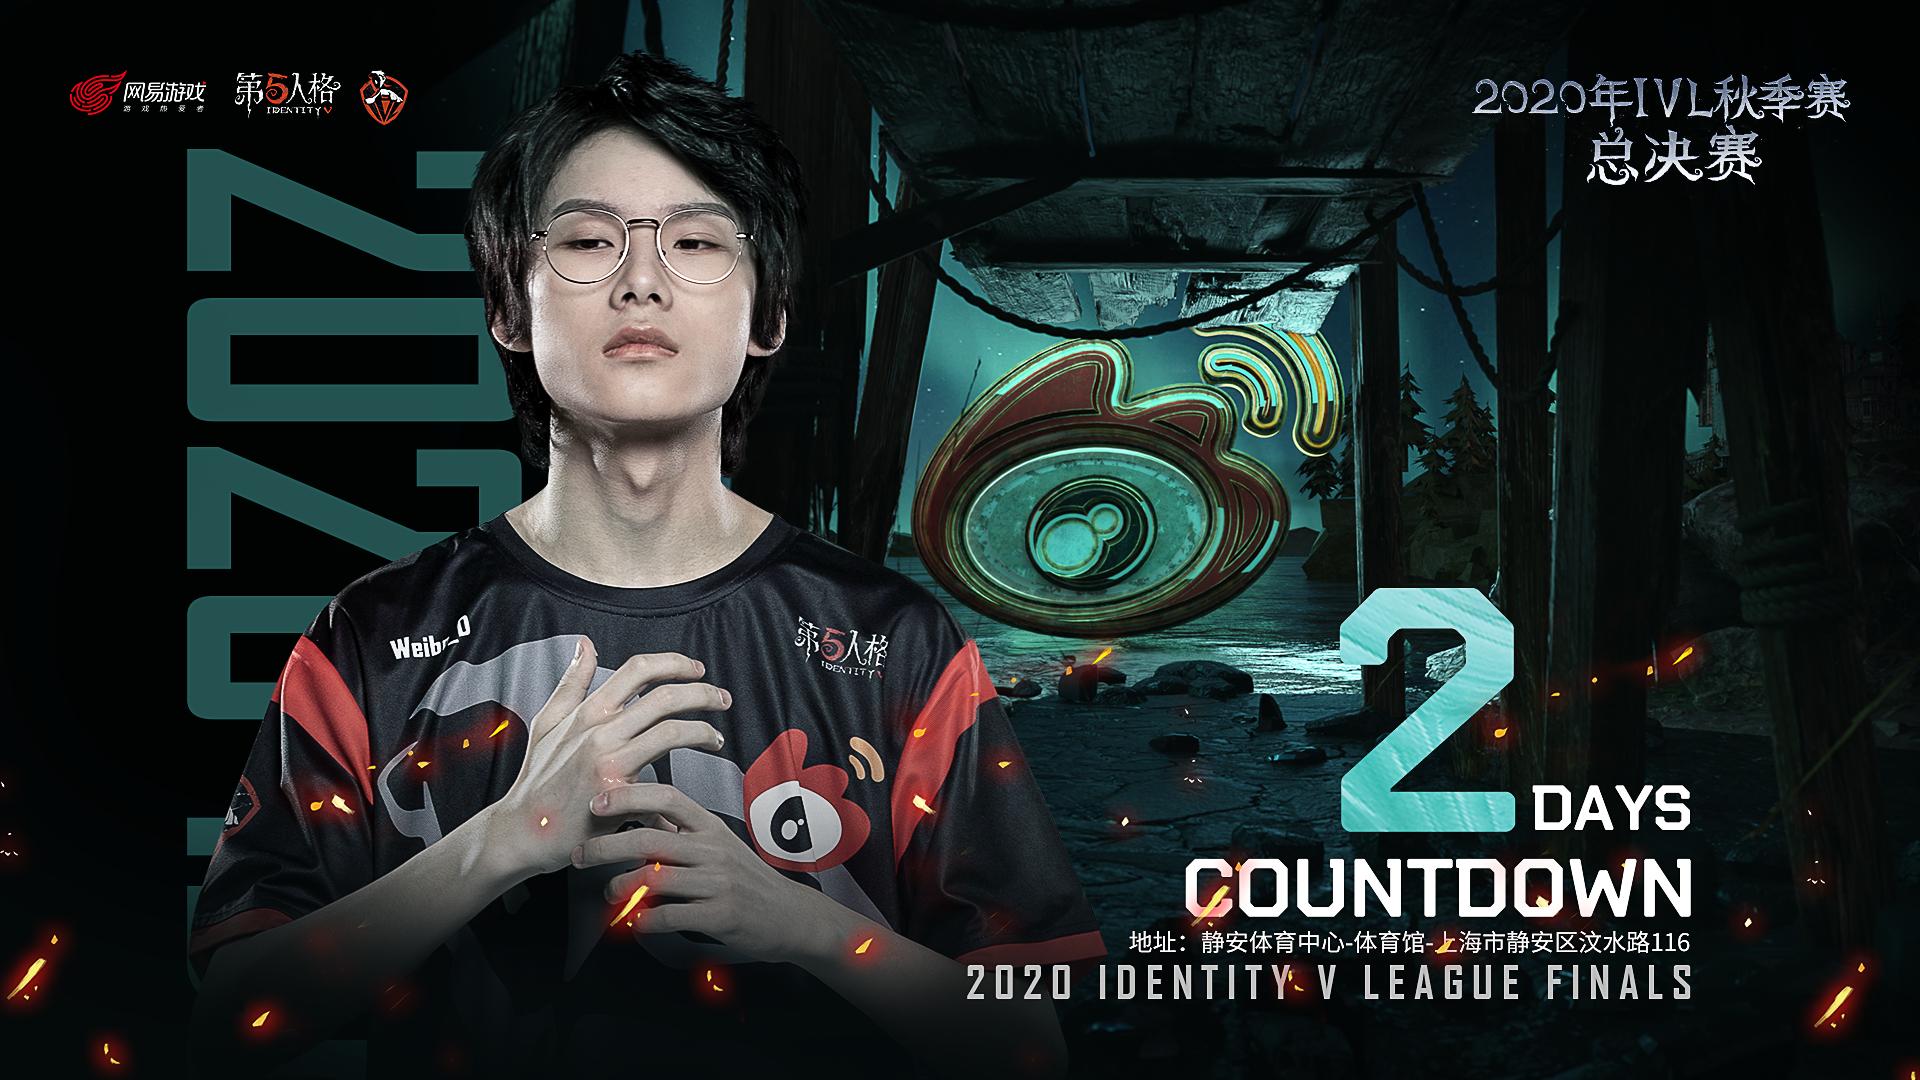 2020IVL秋季赛总决赛倒计时Weibo.jpeg